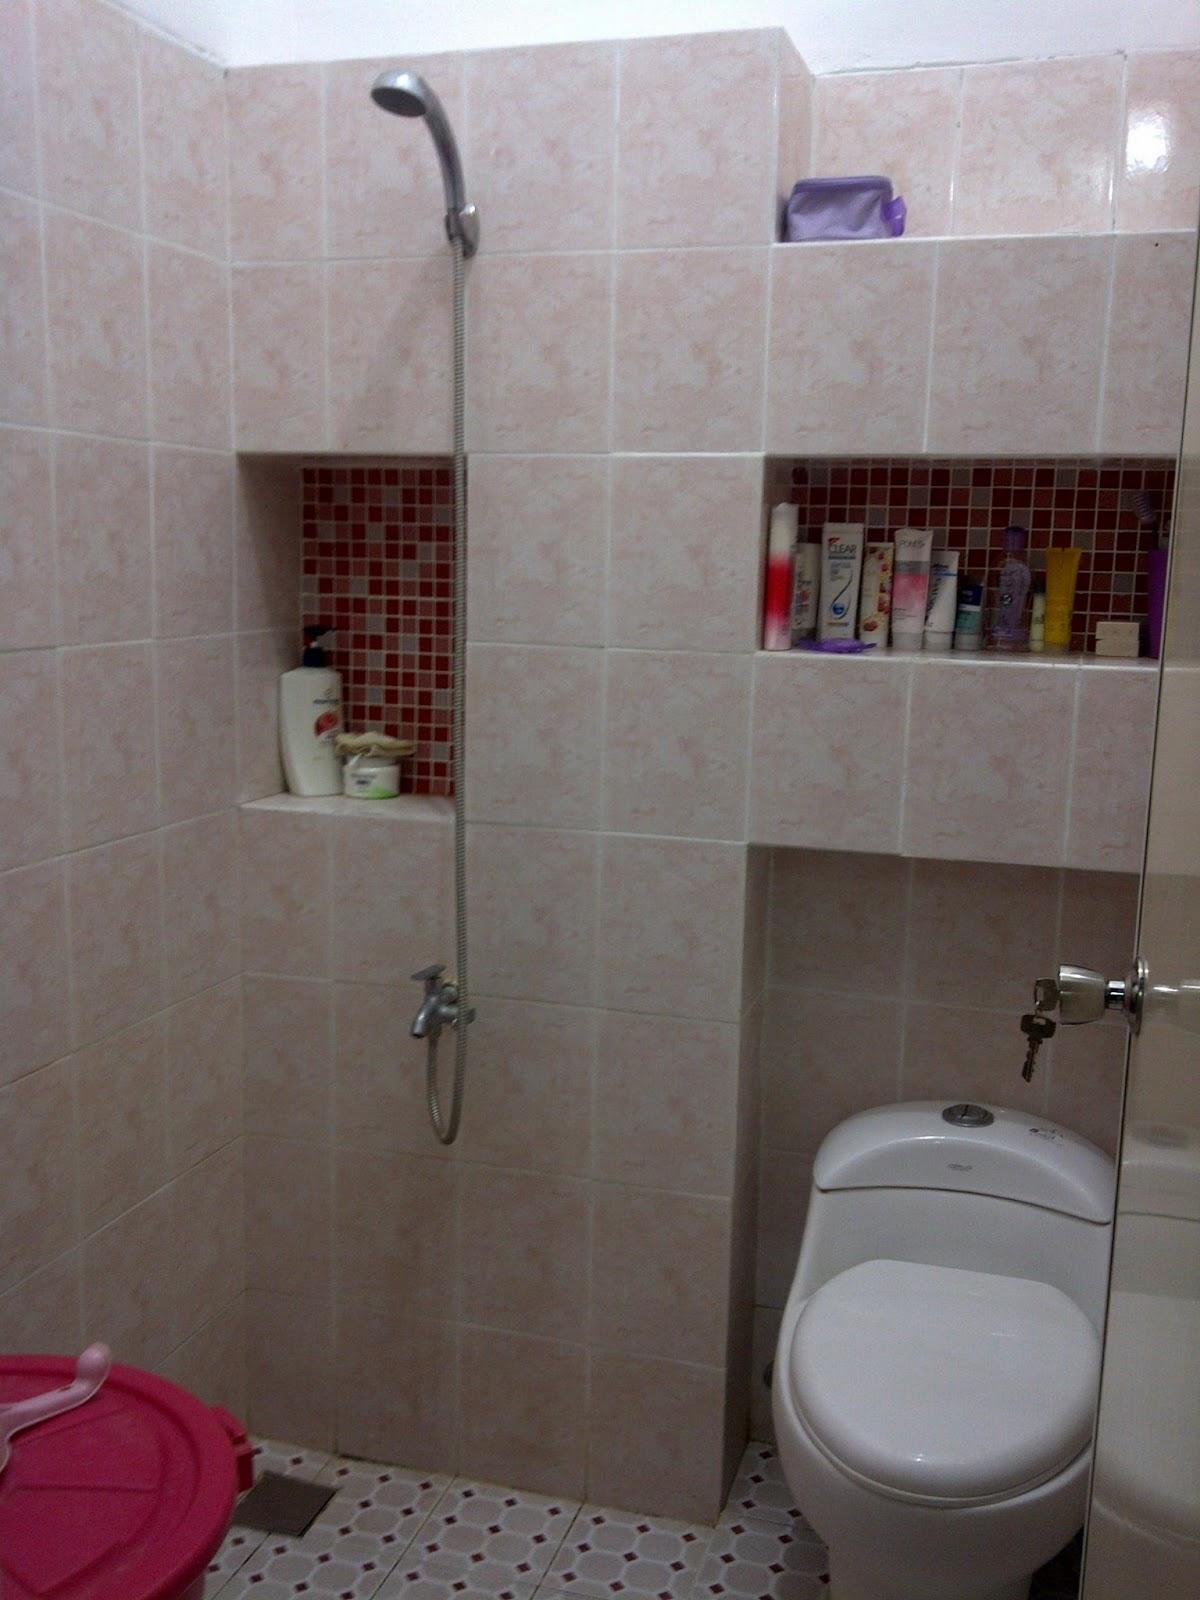 kalian semua pada ingin tau contoh desain minimalist buat kamar mandi ...